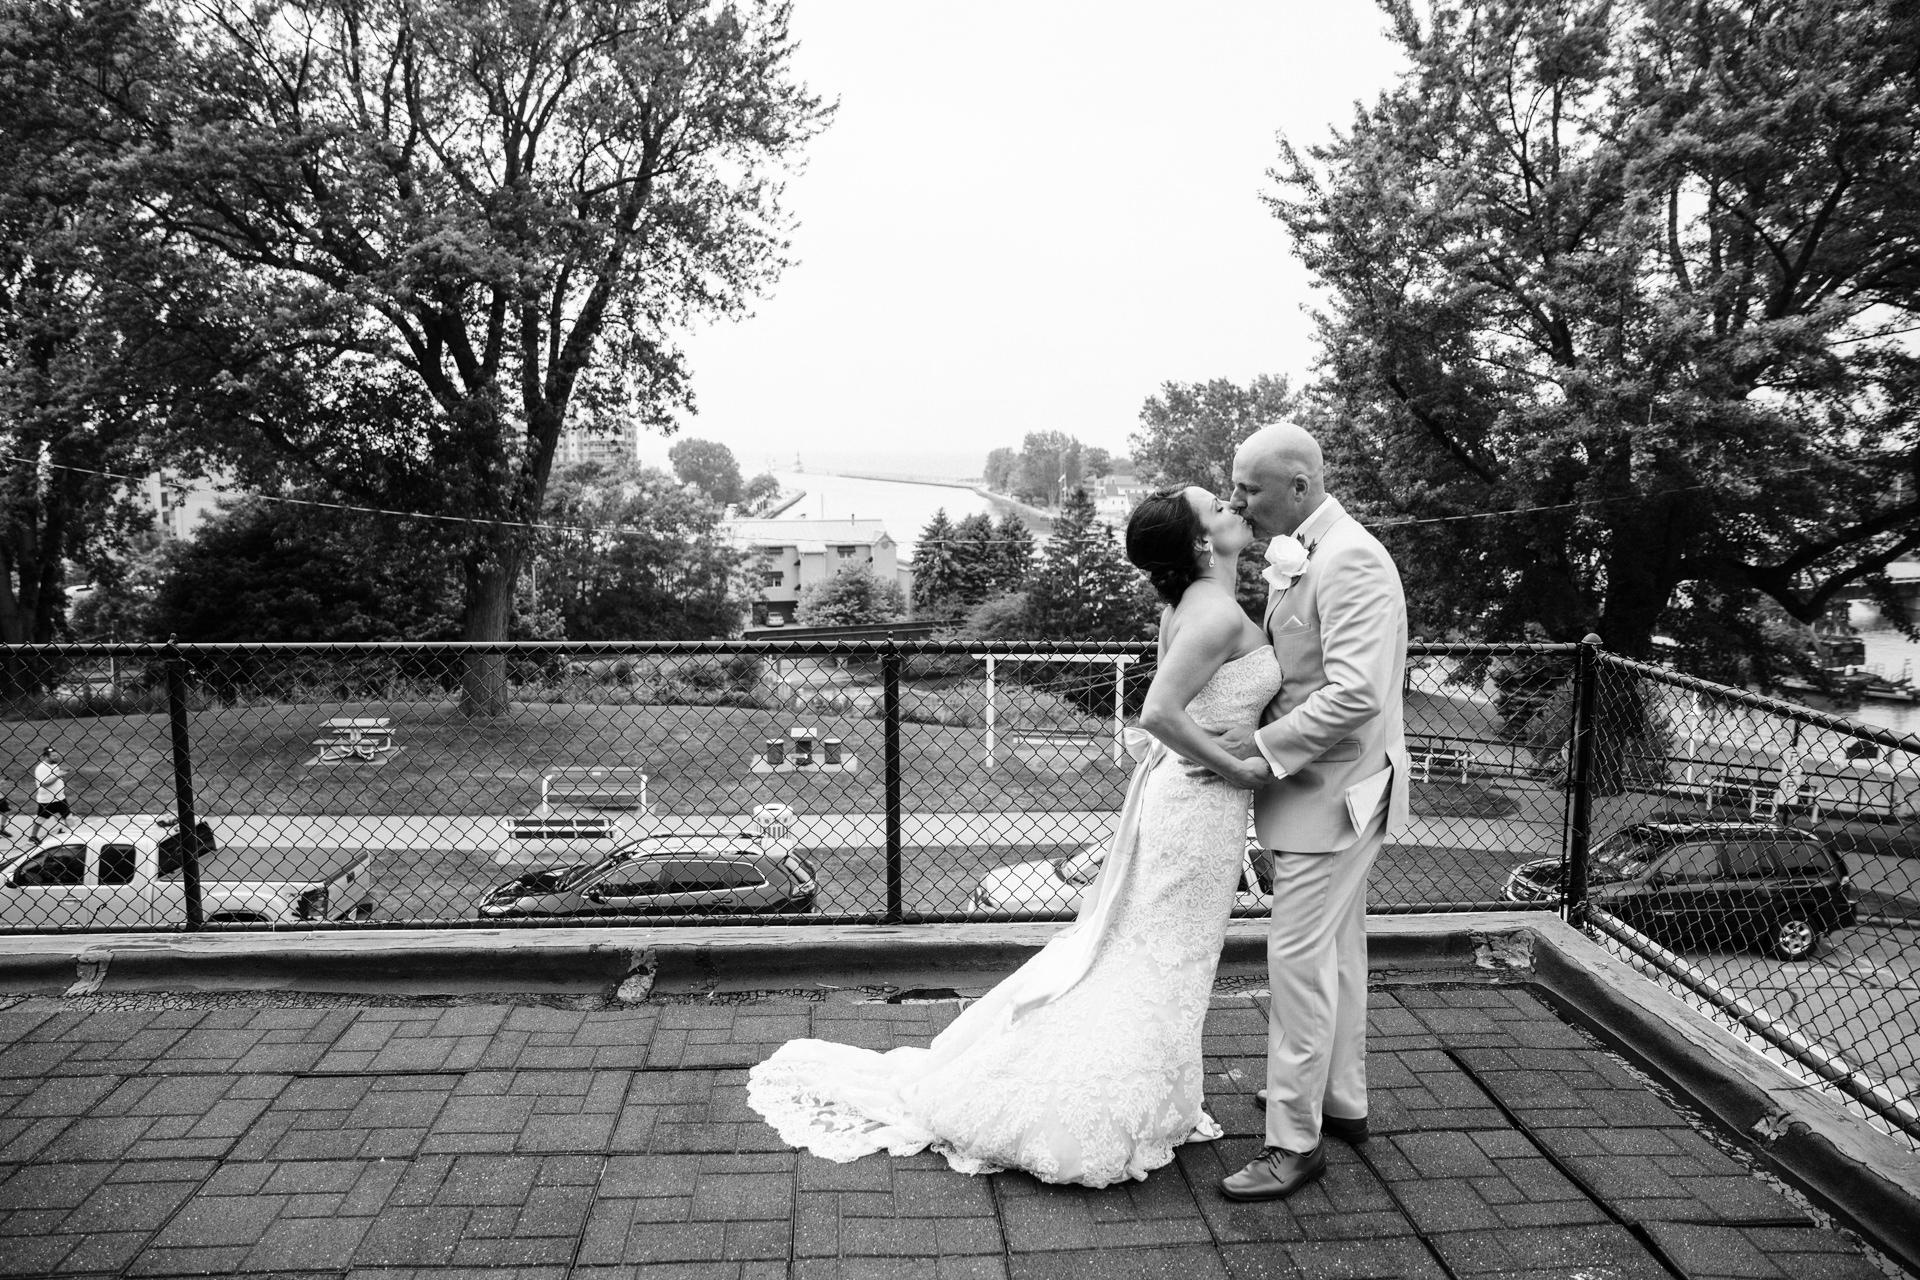 Grant Beachy Tammy Chris wedding photography goshen Saint Joseph veranda whitcomb-047.jpg